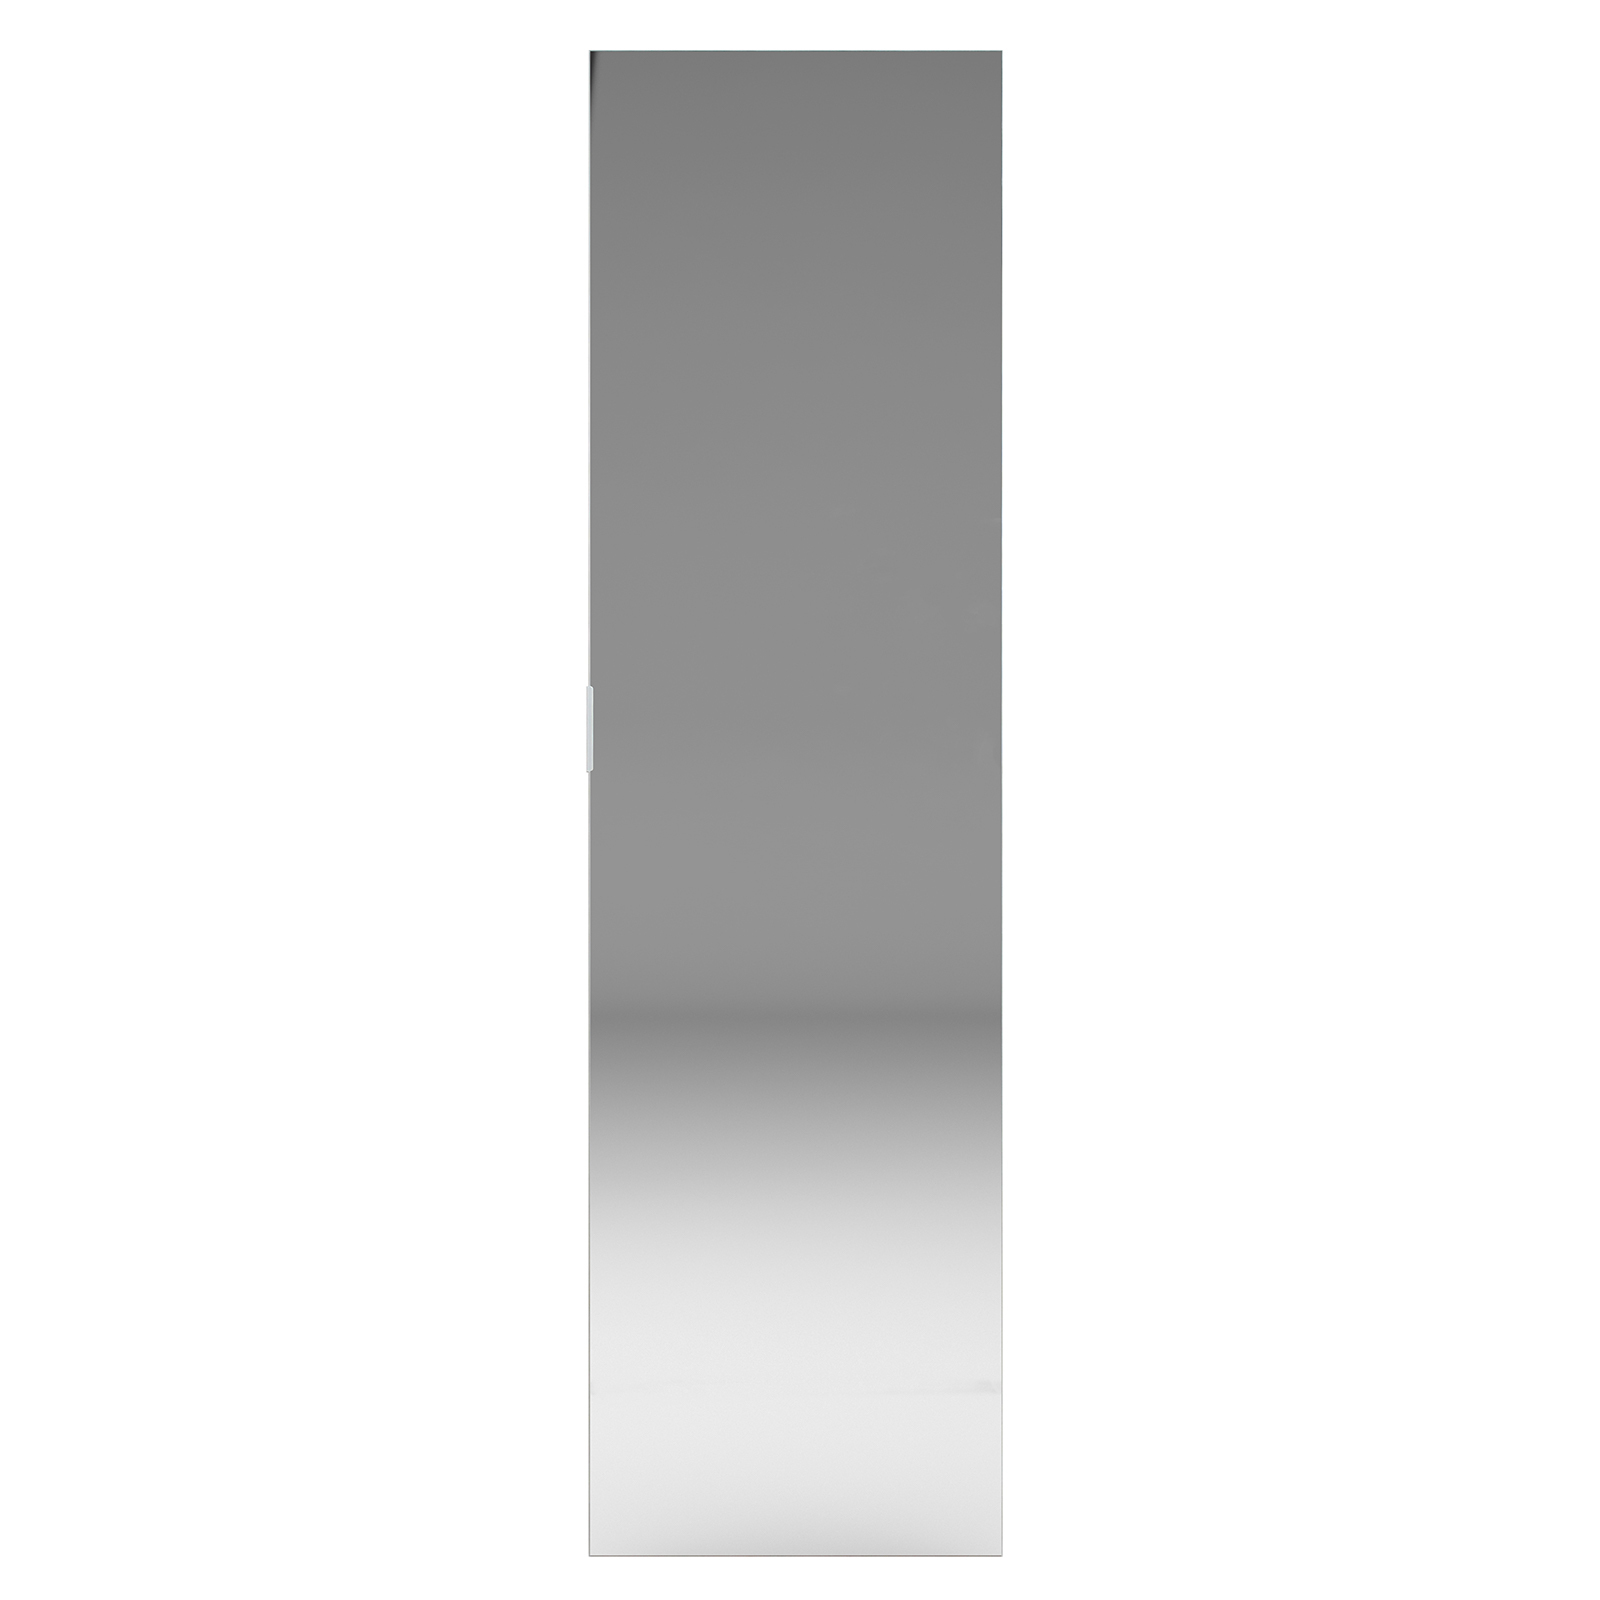 Flexi Storage Mirror Hinge Wardrobe Door